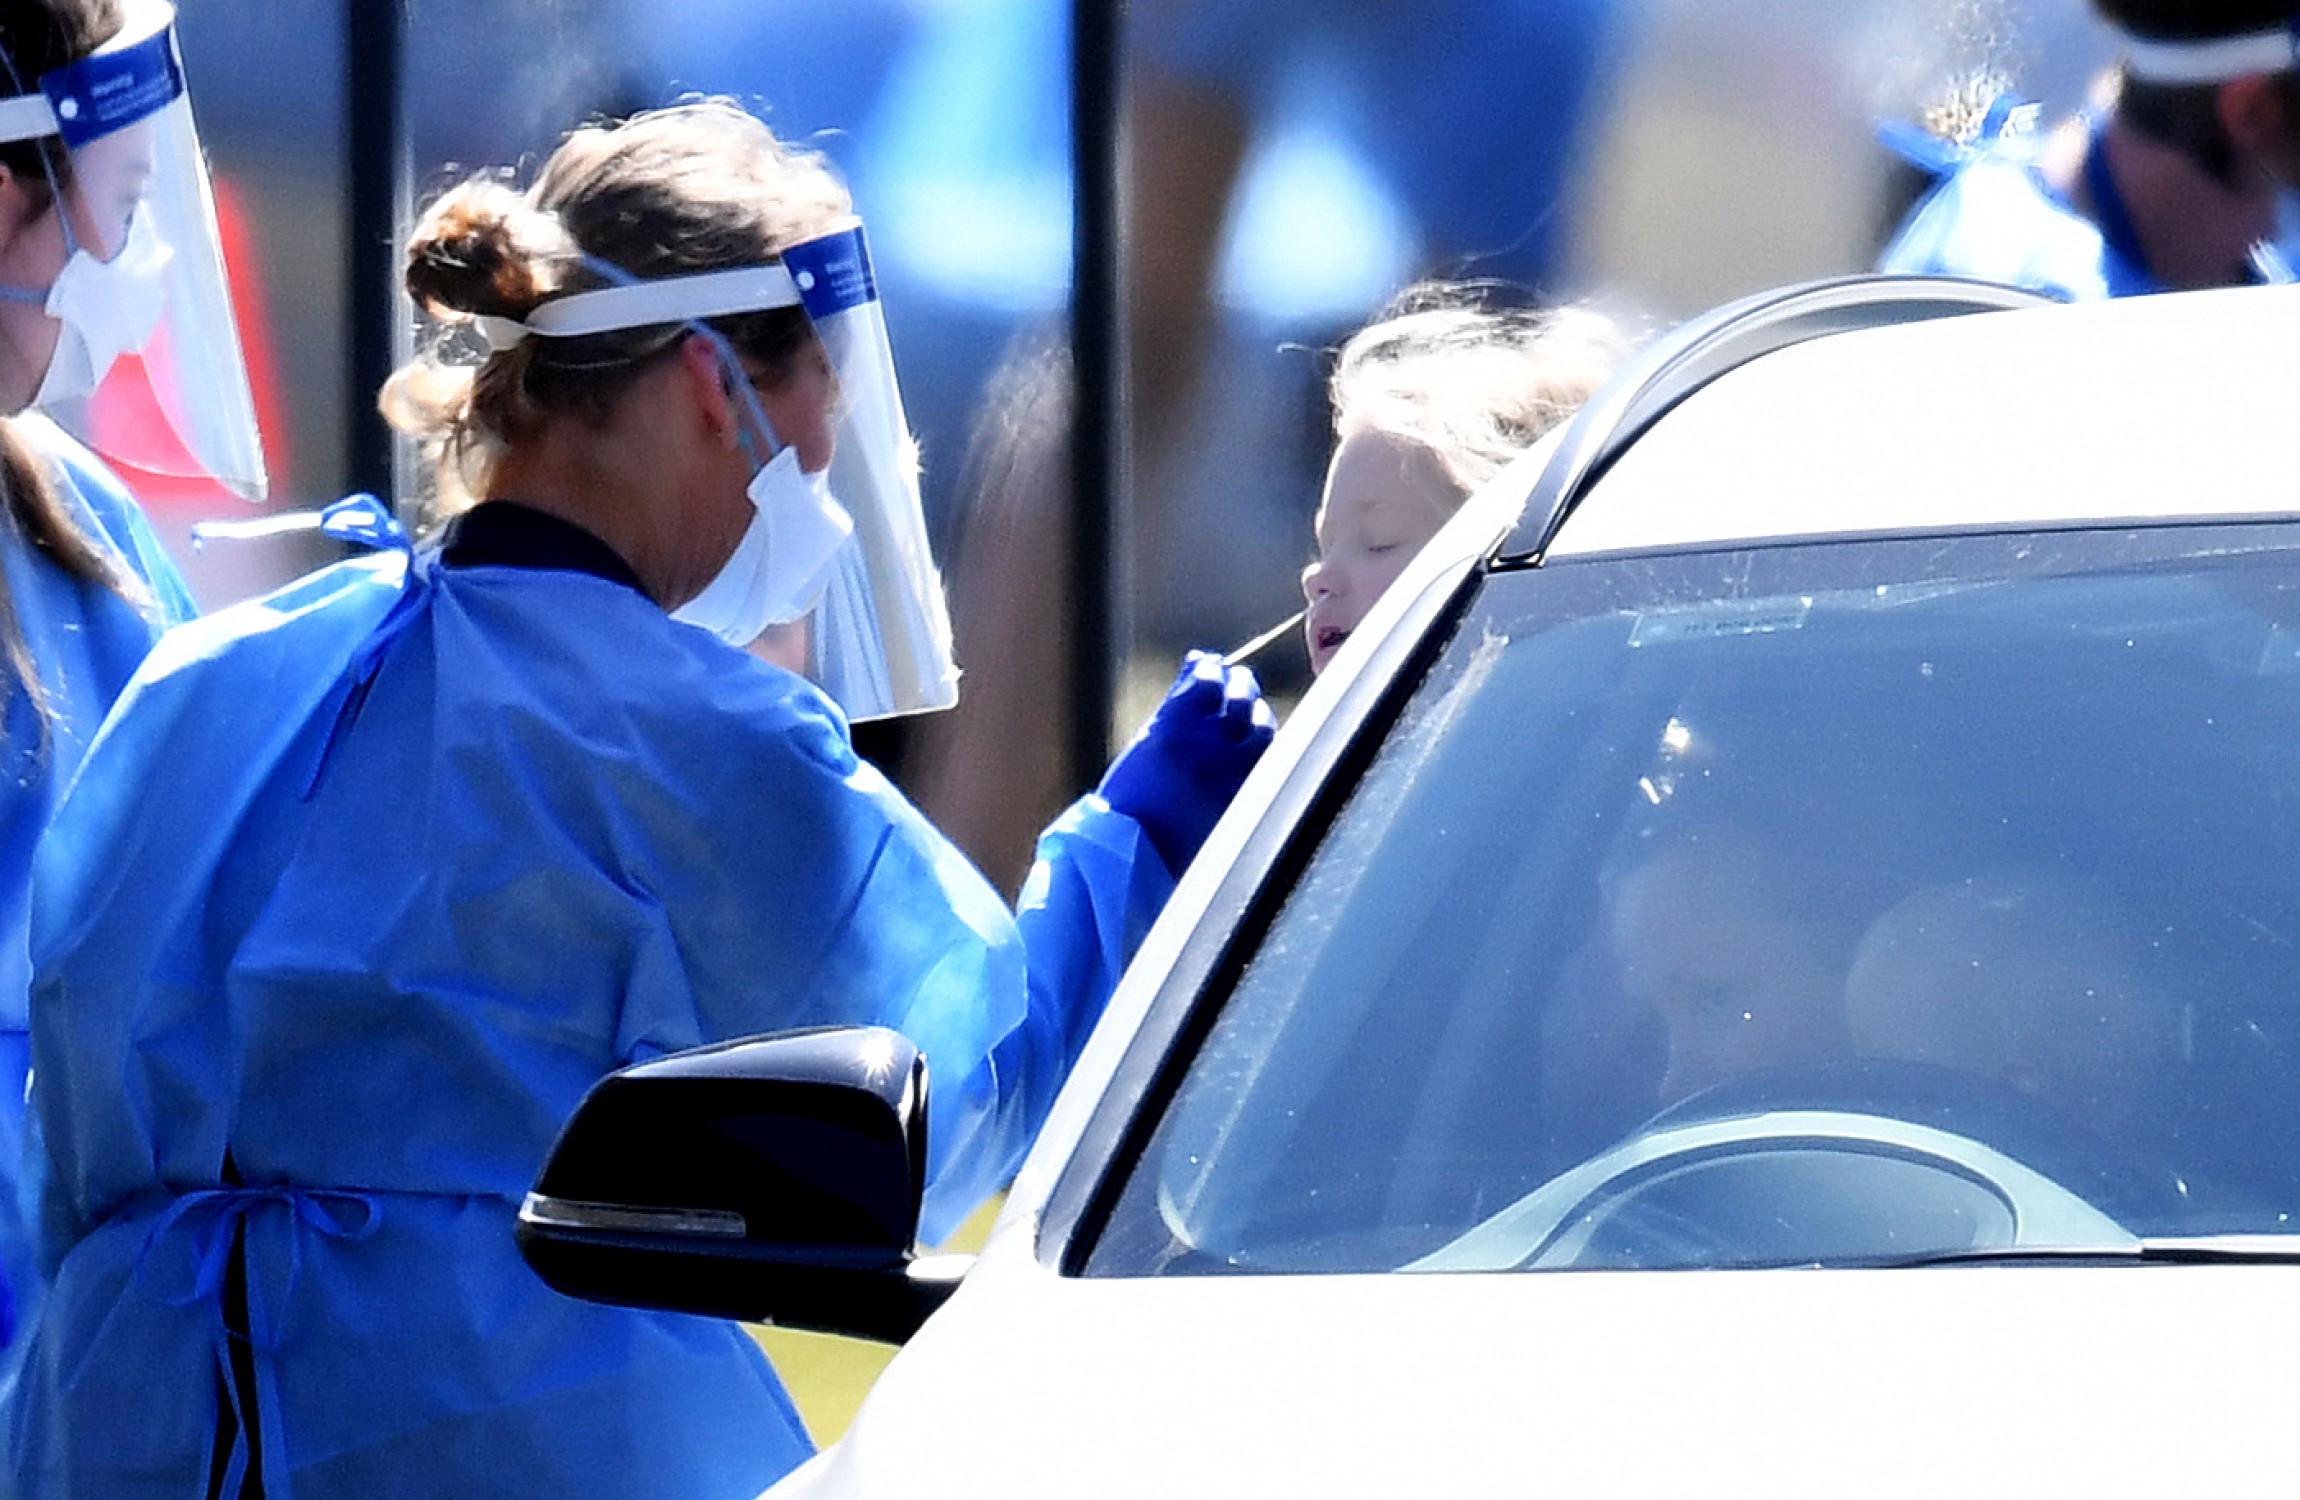 Australia's third-largest city of Brisbane to enter snap lockdown